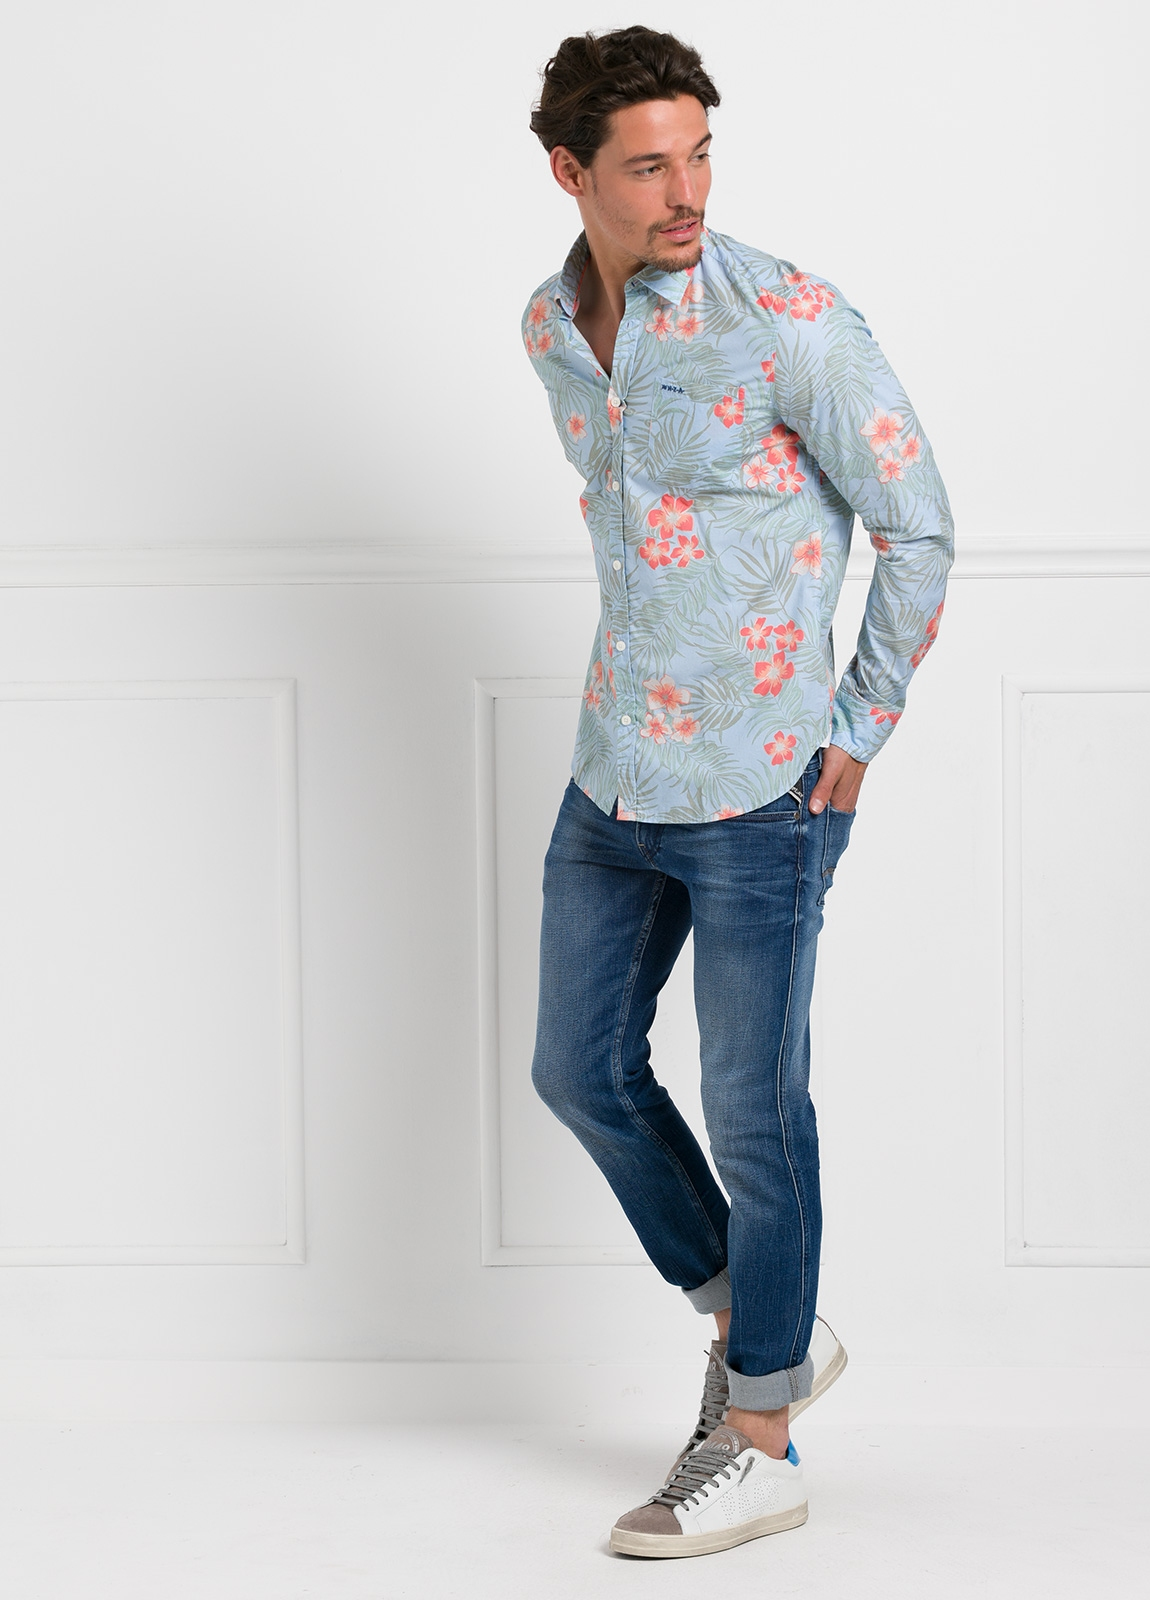 Camisa Sport dibujo flores color azul, 100% Algodón. - Ítem1